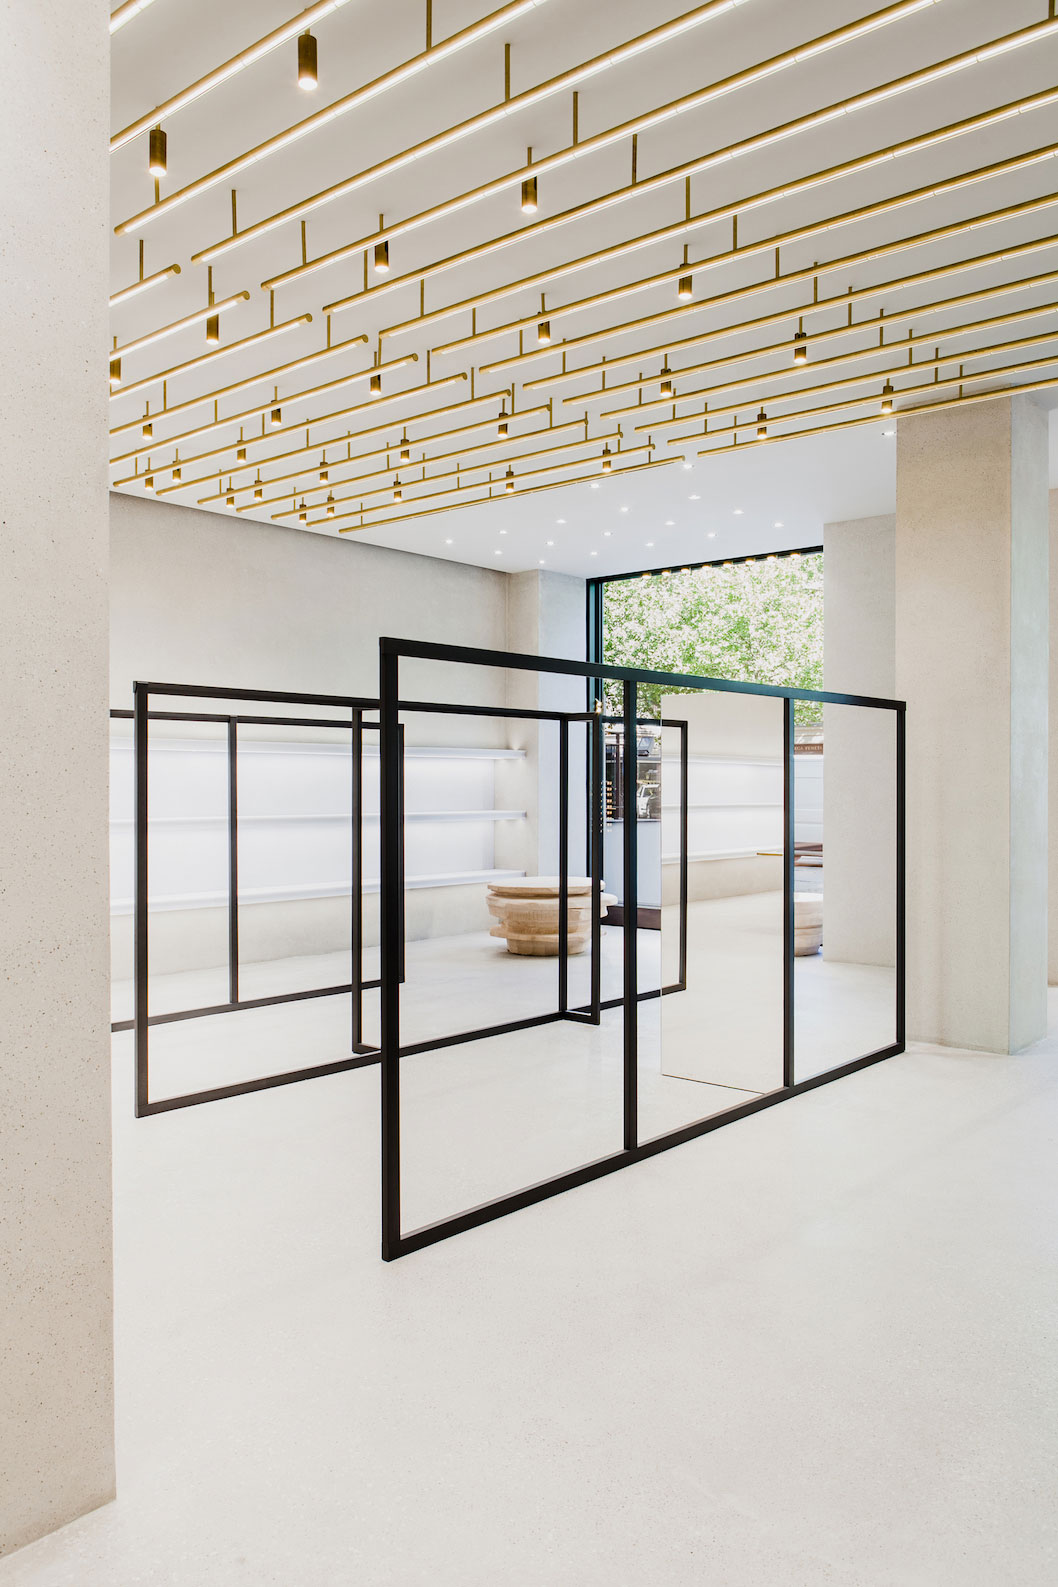 Jil Sanderu0027s New Berlin Store By Andrea Tognon Architecture | Yellowtrace